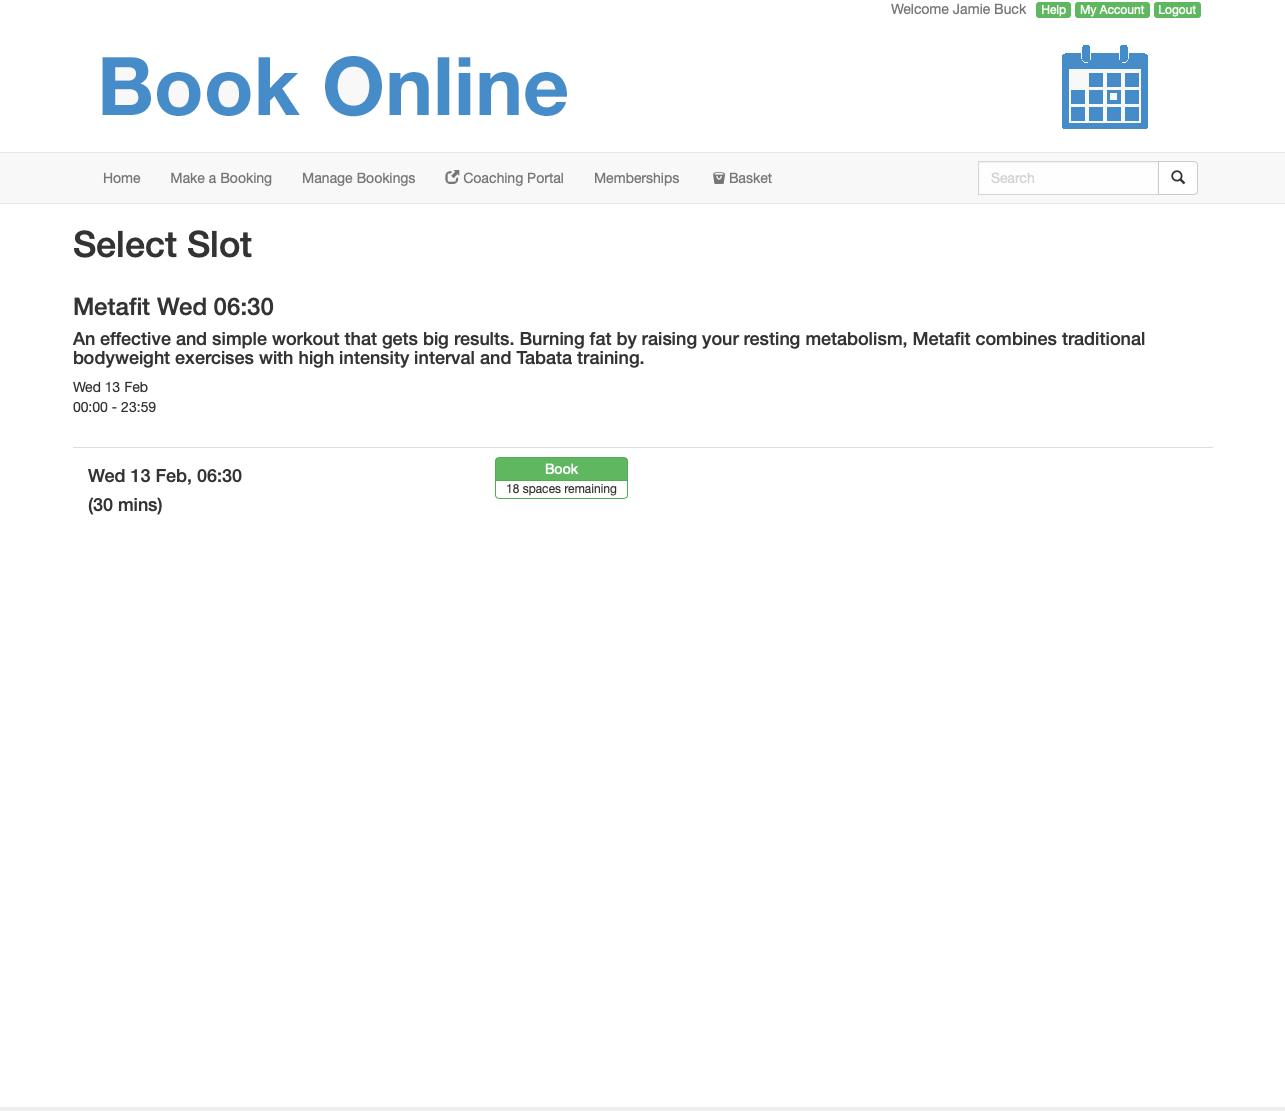 Deep Click to Book link